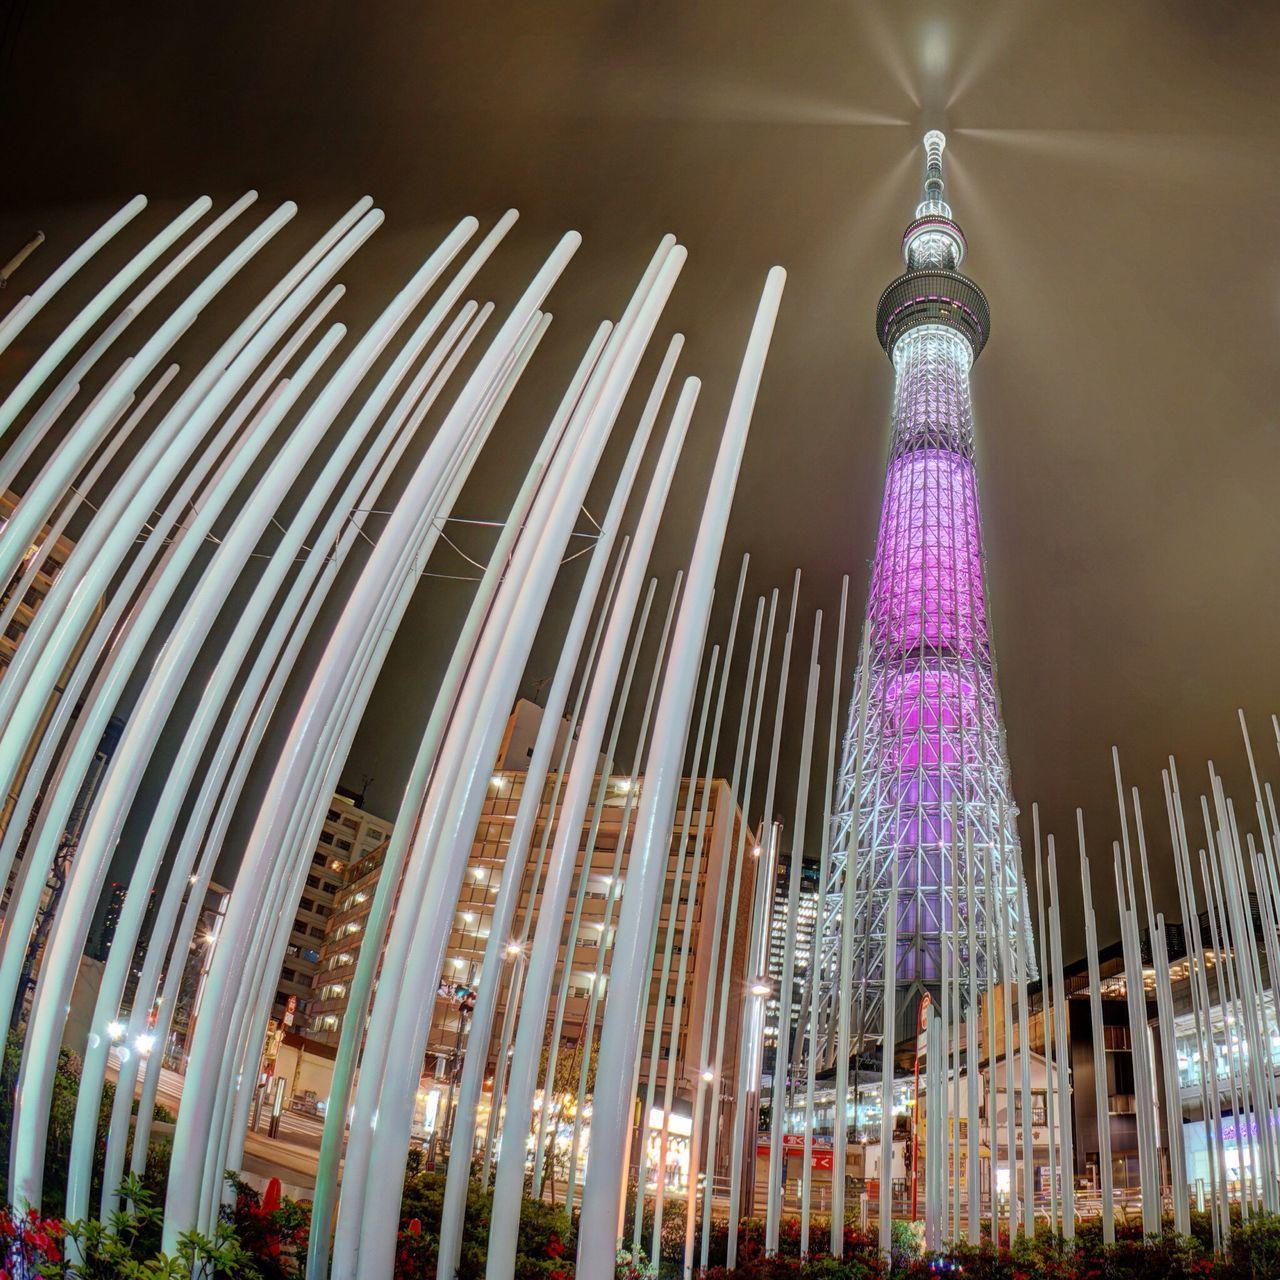 Tokyo Night Night Lights Illuminated Illumination Tokyo Sky Tree 舞 The Architect - 2016 EyeEm Awards Cities At Night Night View Found On The Roll The Photojournalist - 2016 EyeEm Awards The Street Photographer - 2016 EyeEm Awards The Great Outdoors - 2016 EyeEm Awards